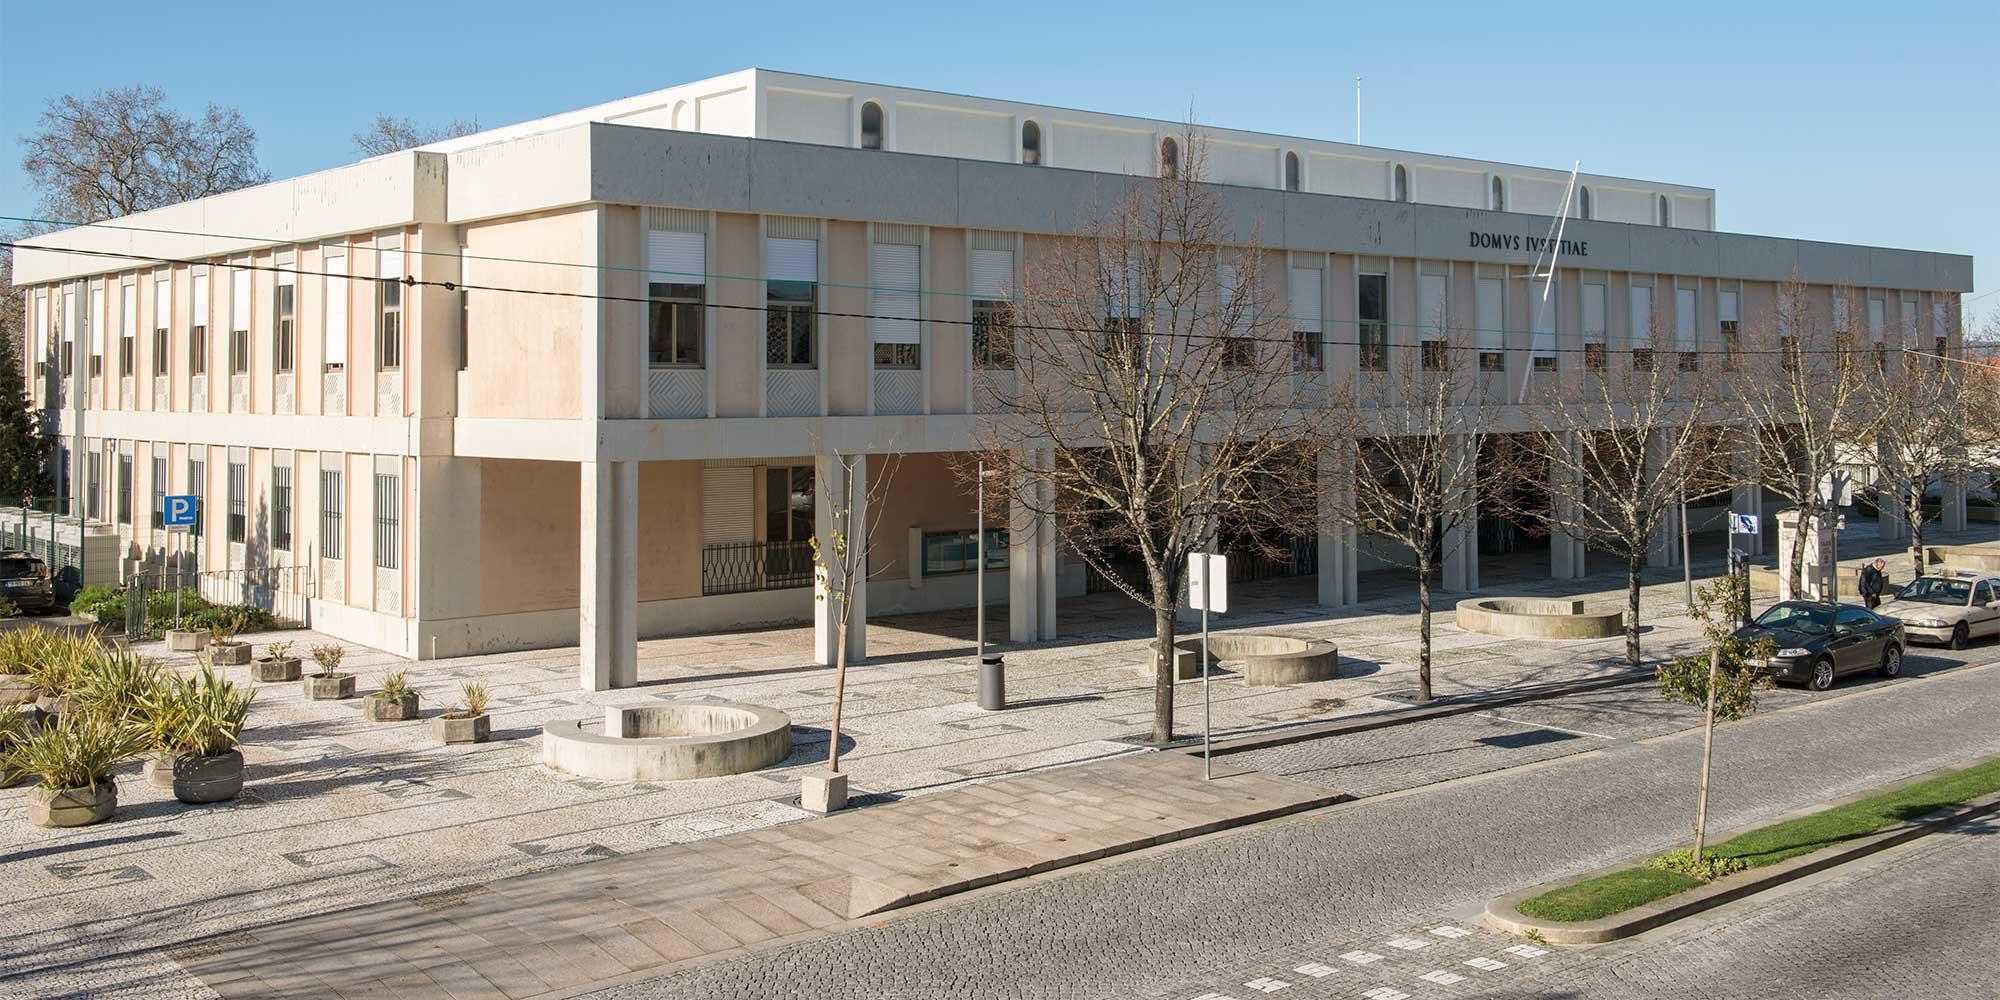 Tribunal de Penafiel evacuado devido a ameaça de bomba